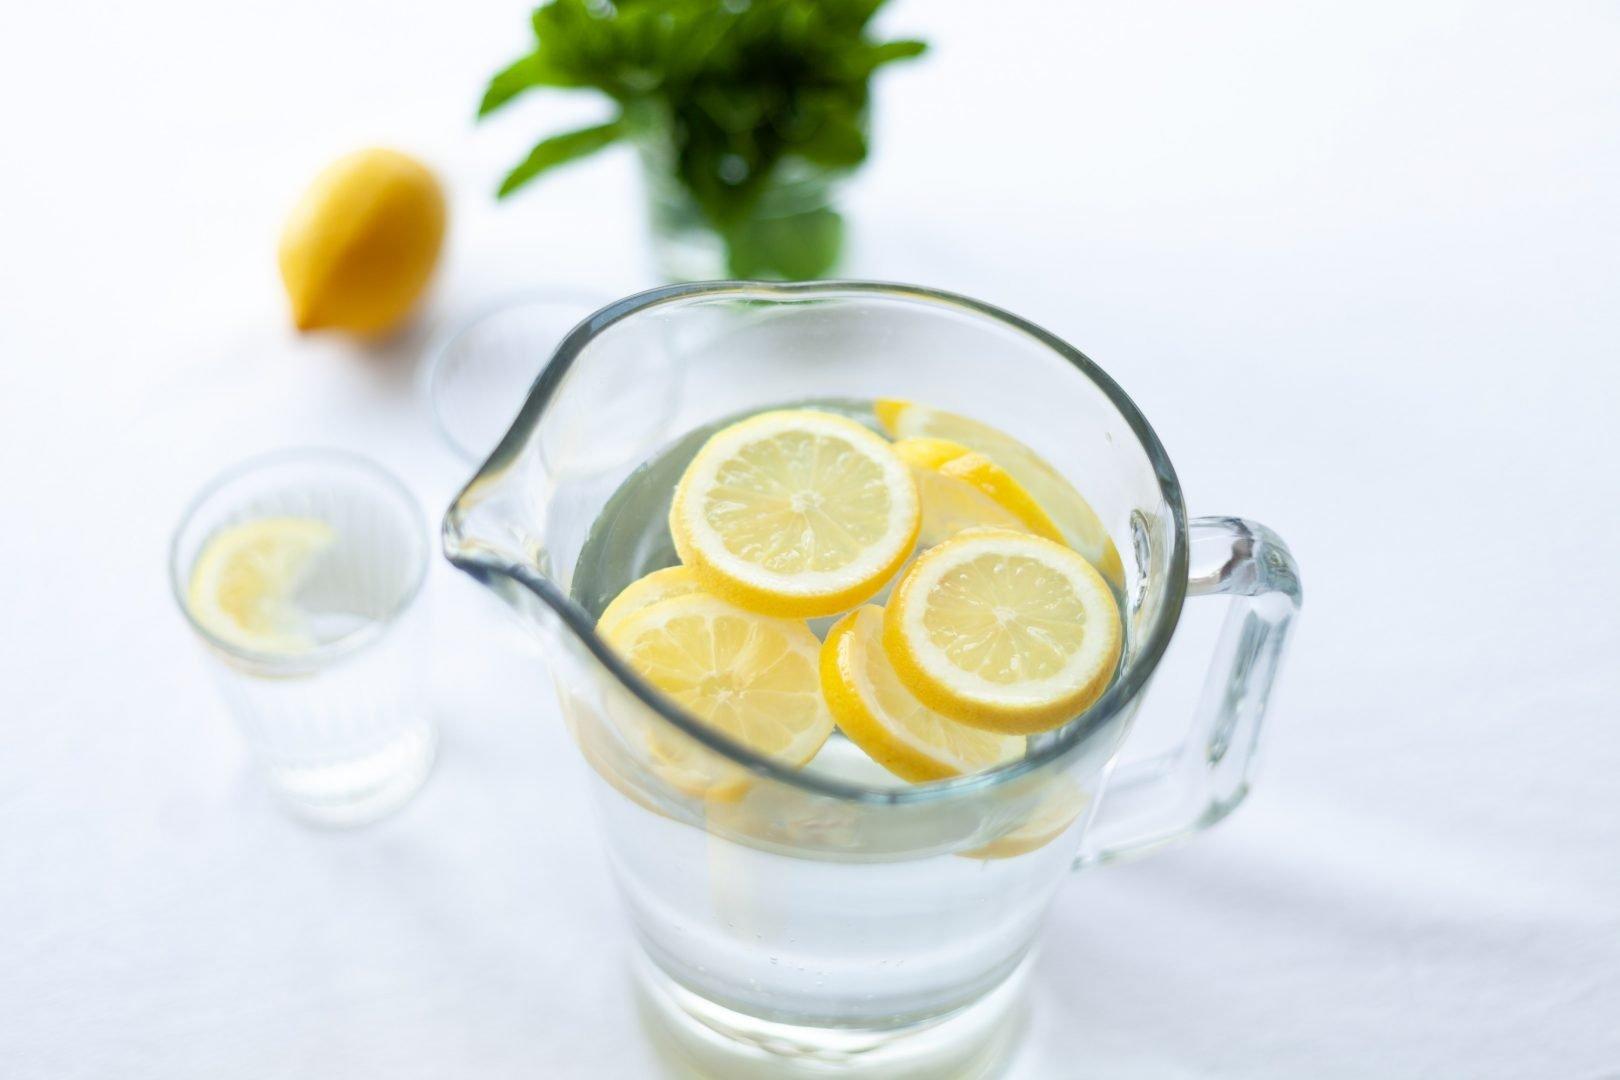 citrus-close-up-drink